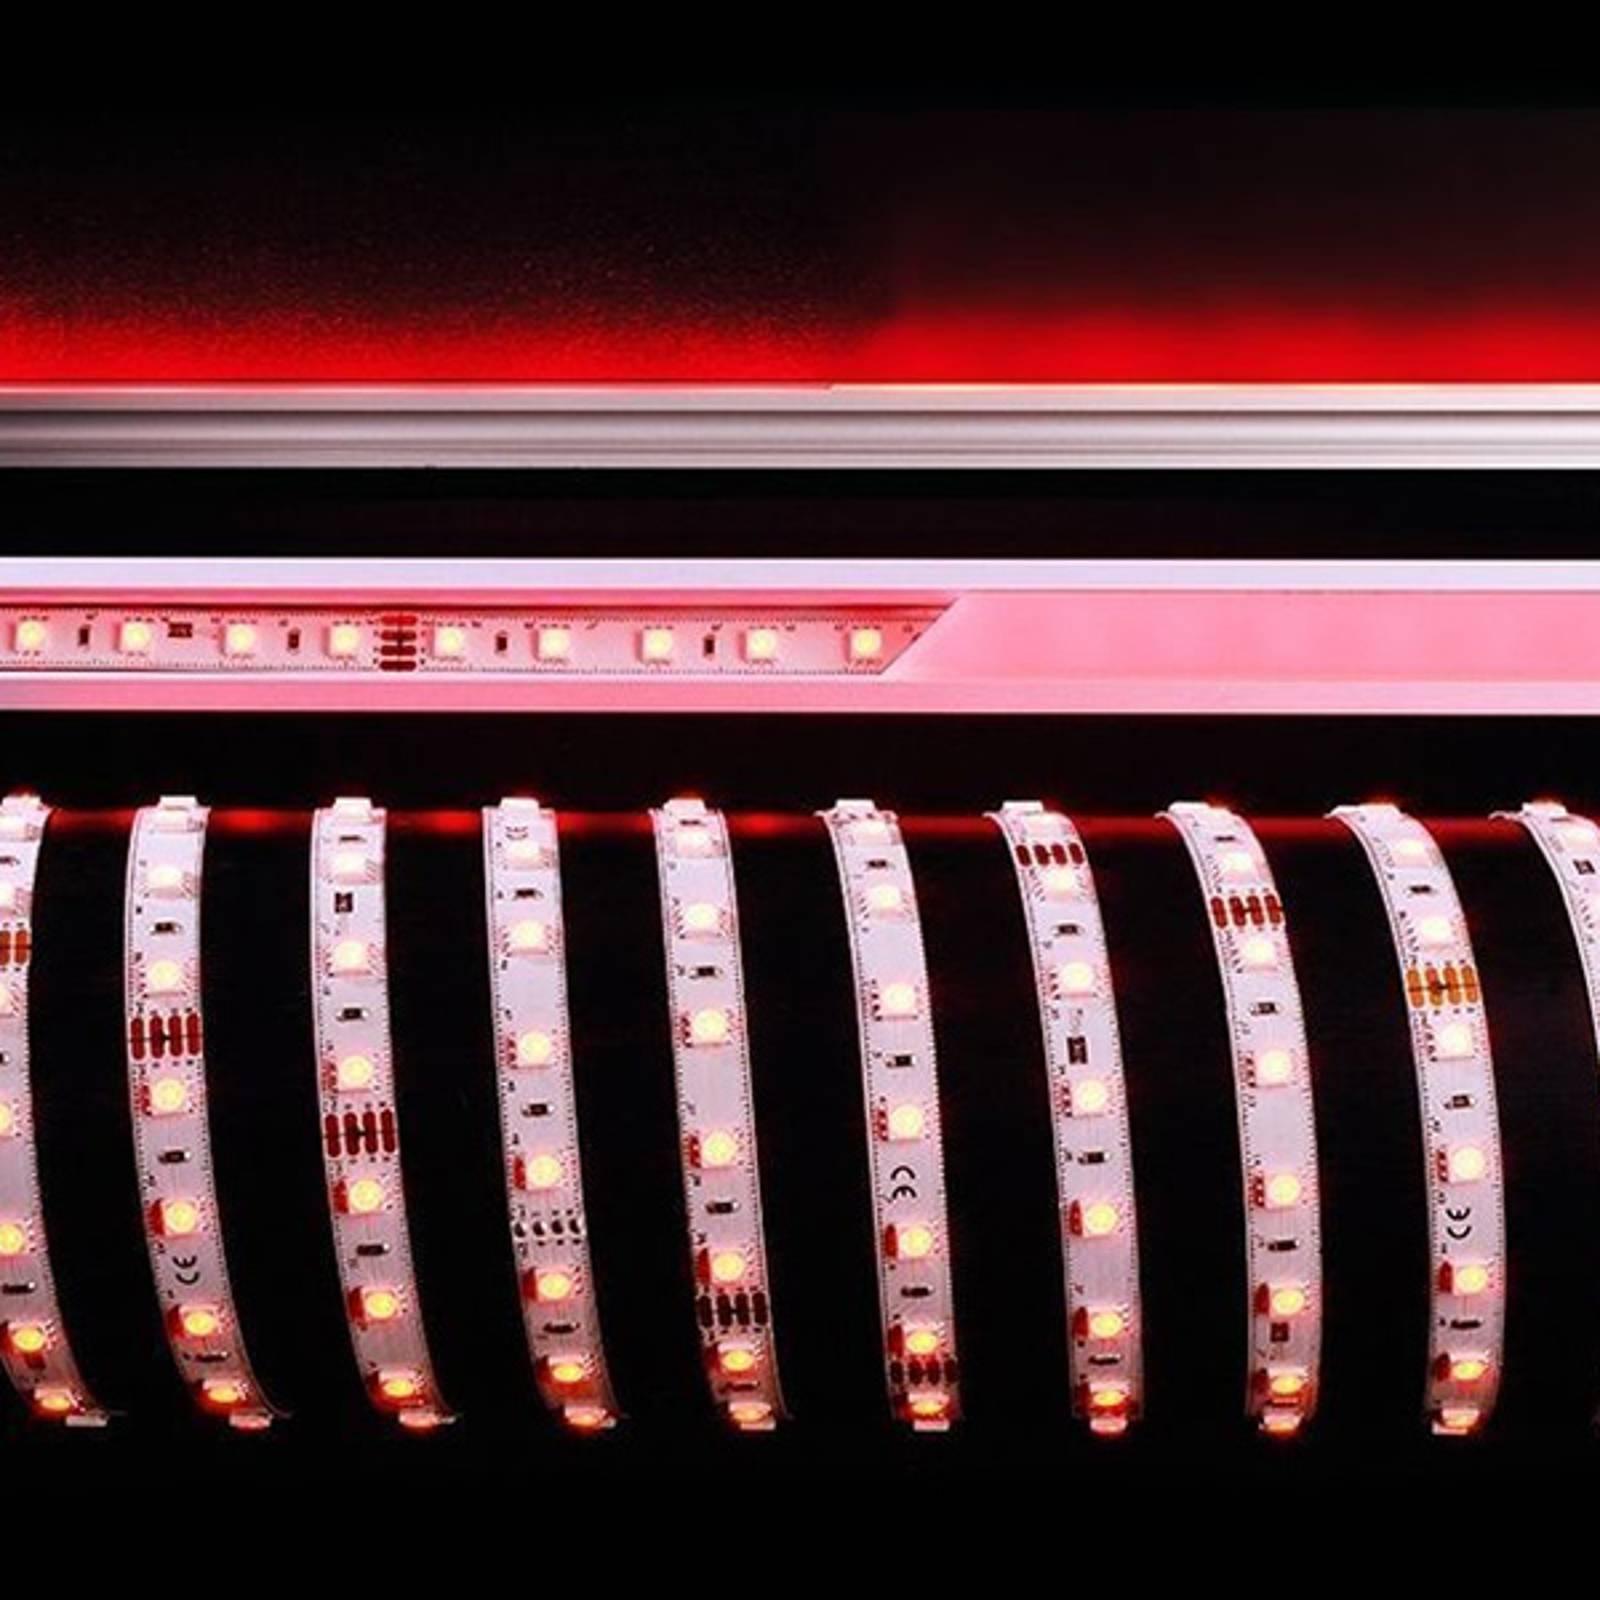 Fleksibel LED-stripe 484 nm 60 W 500x1x0,3 cm